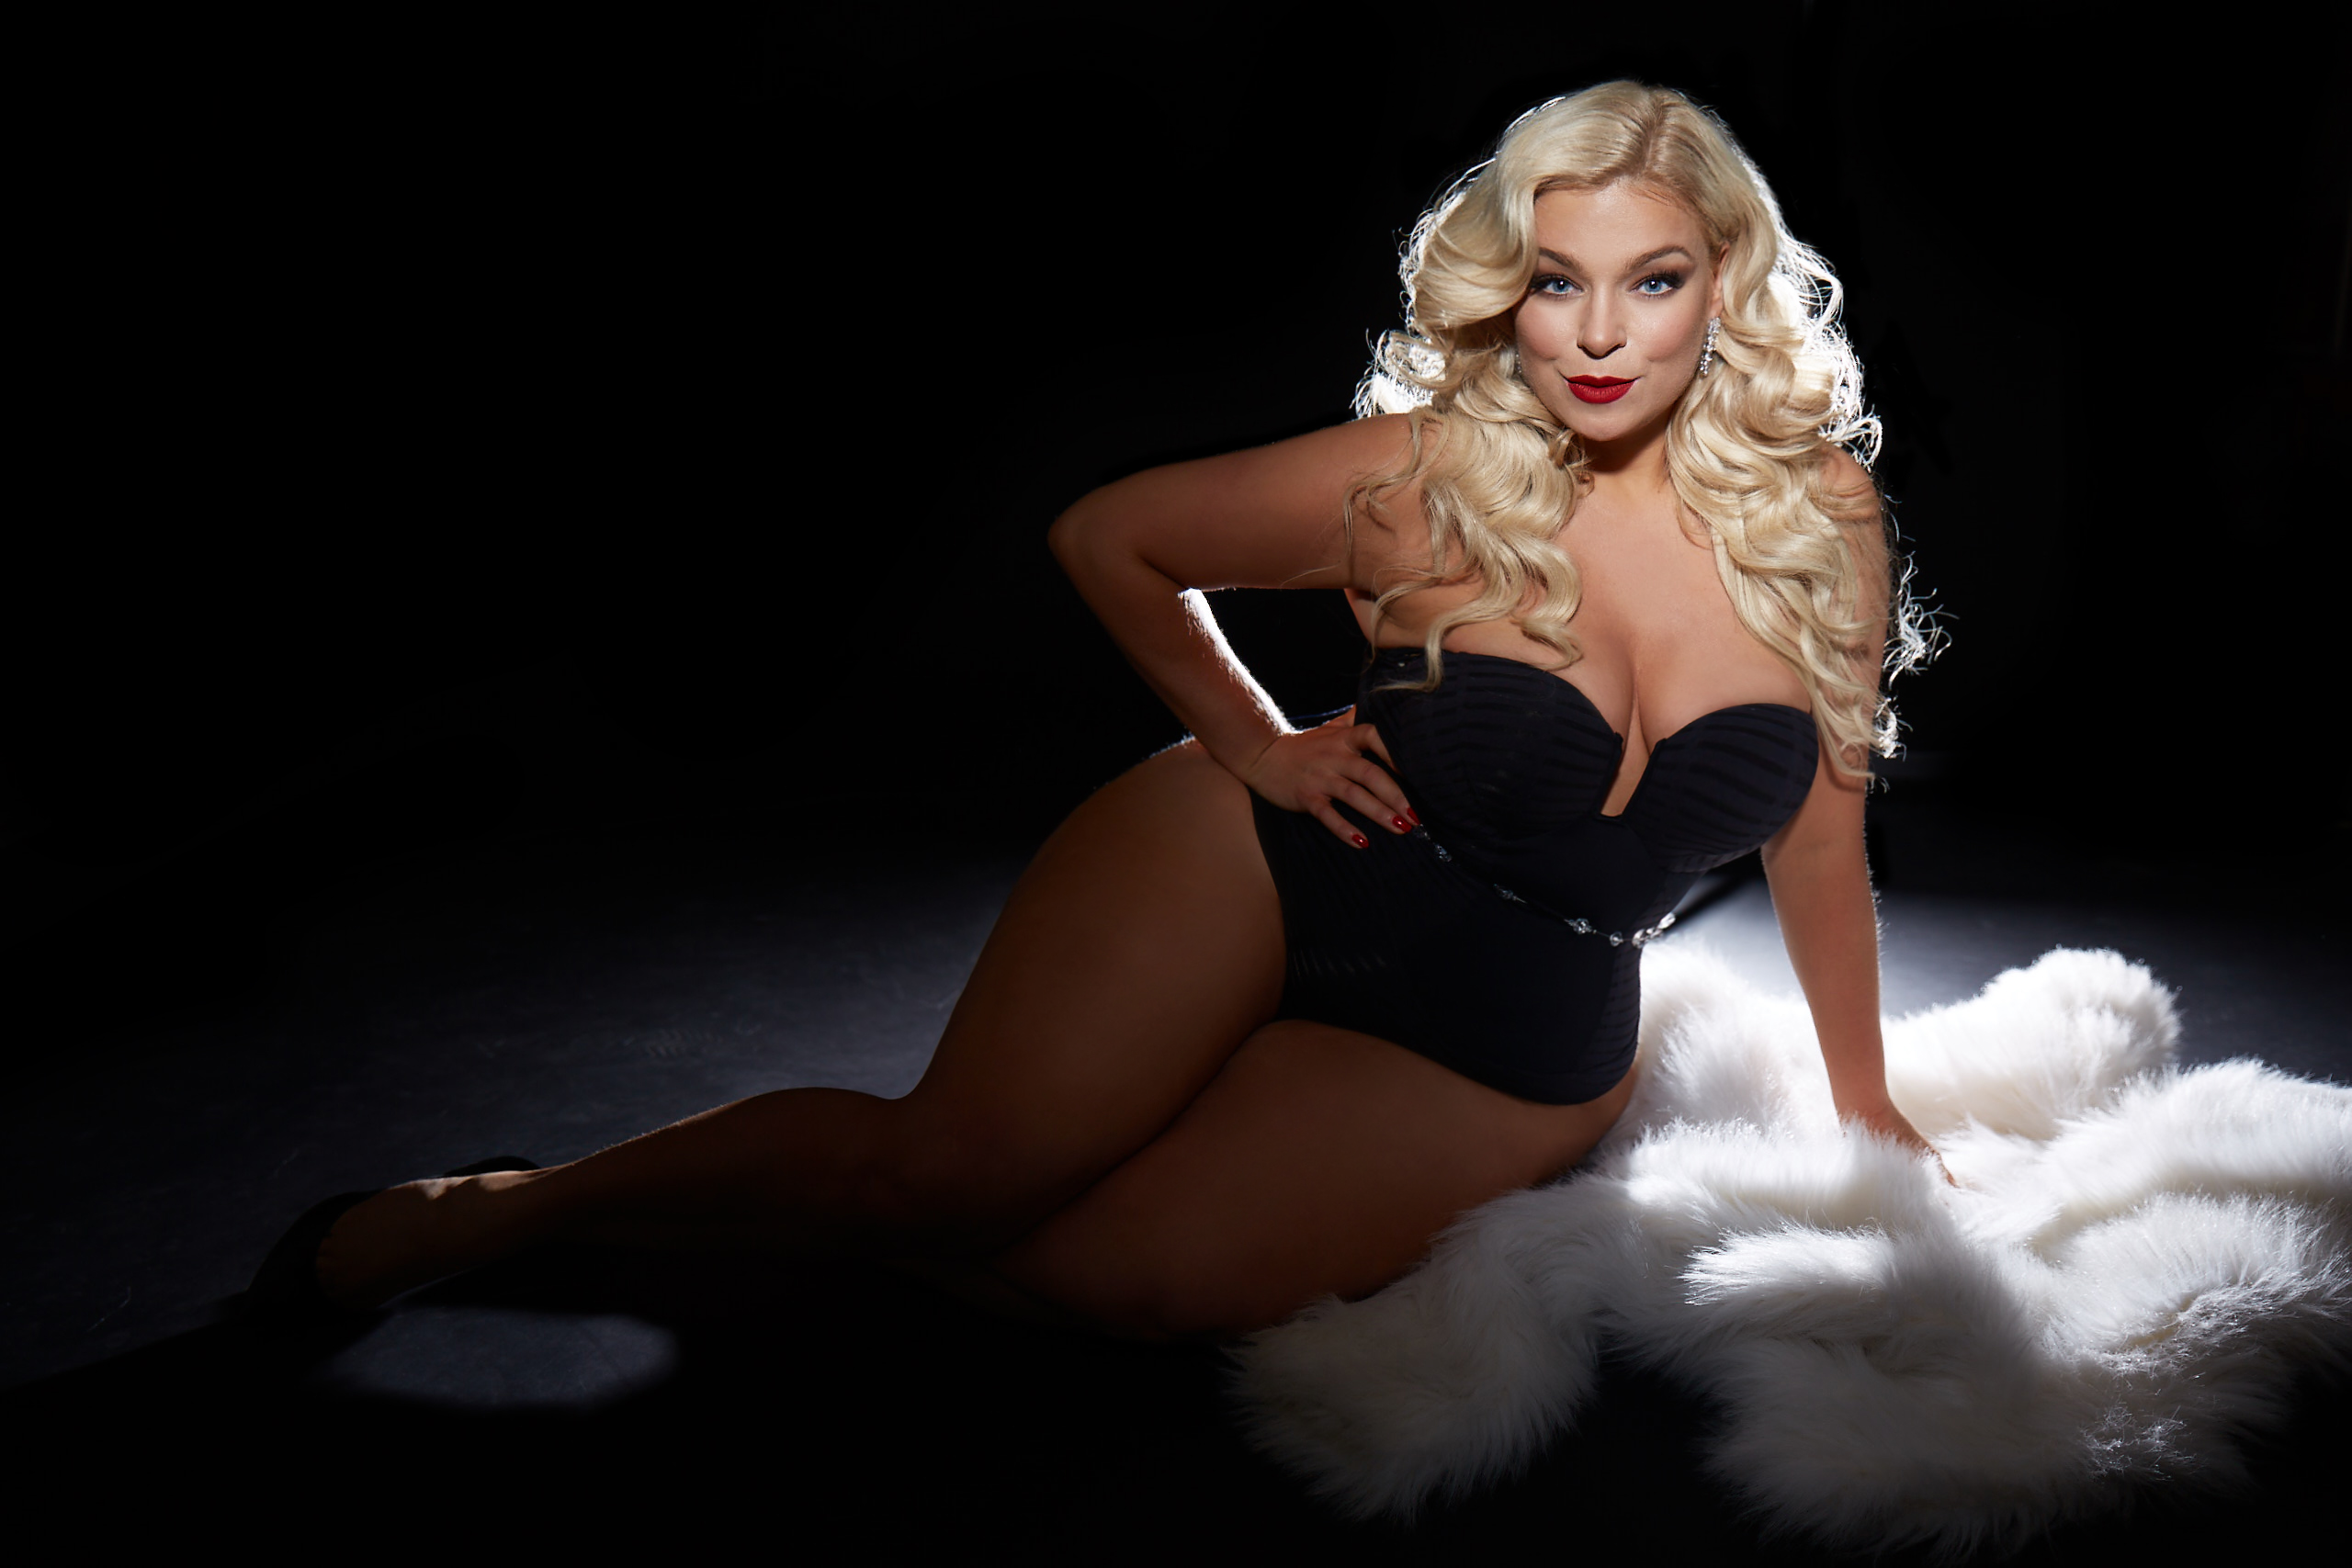 caterina-pogorzelski-Megabambi-Marina-Rinaldi-Bloggerin-Plussize-Curvy-Moderatorin-Plussize-Model